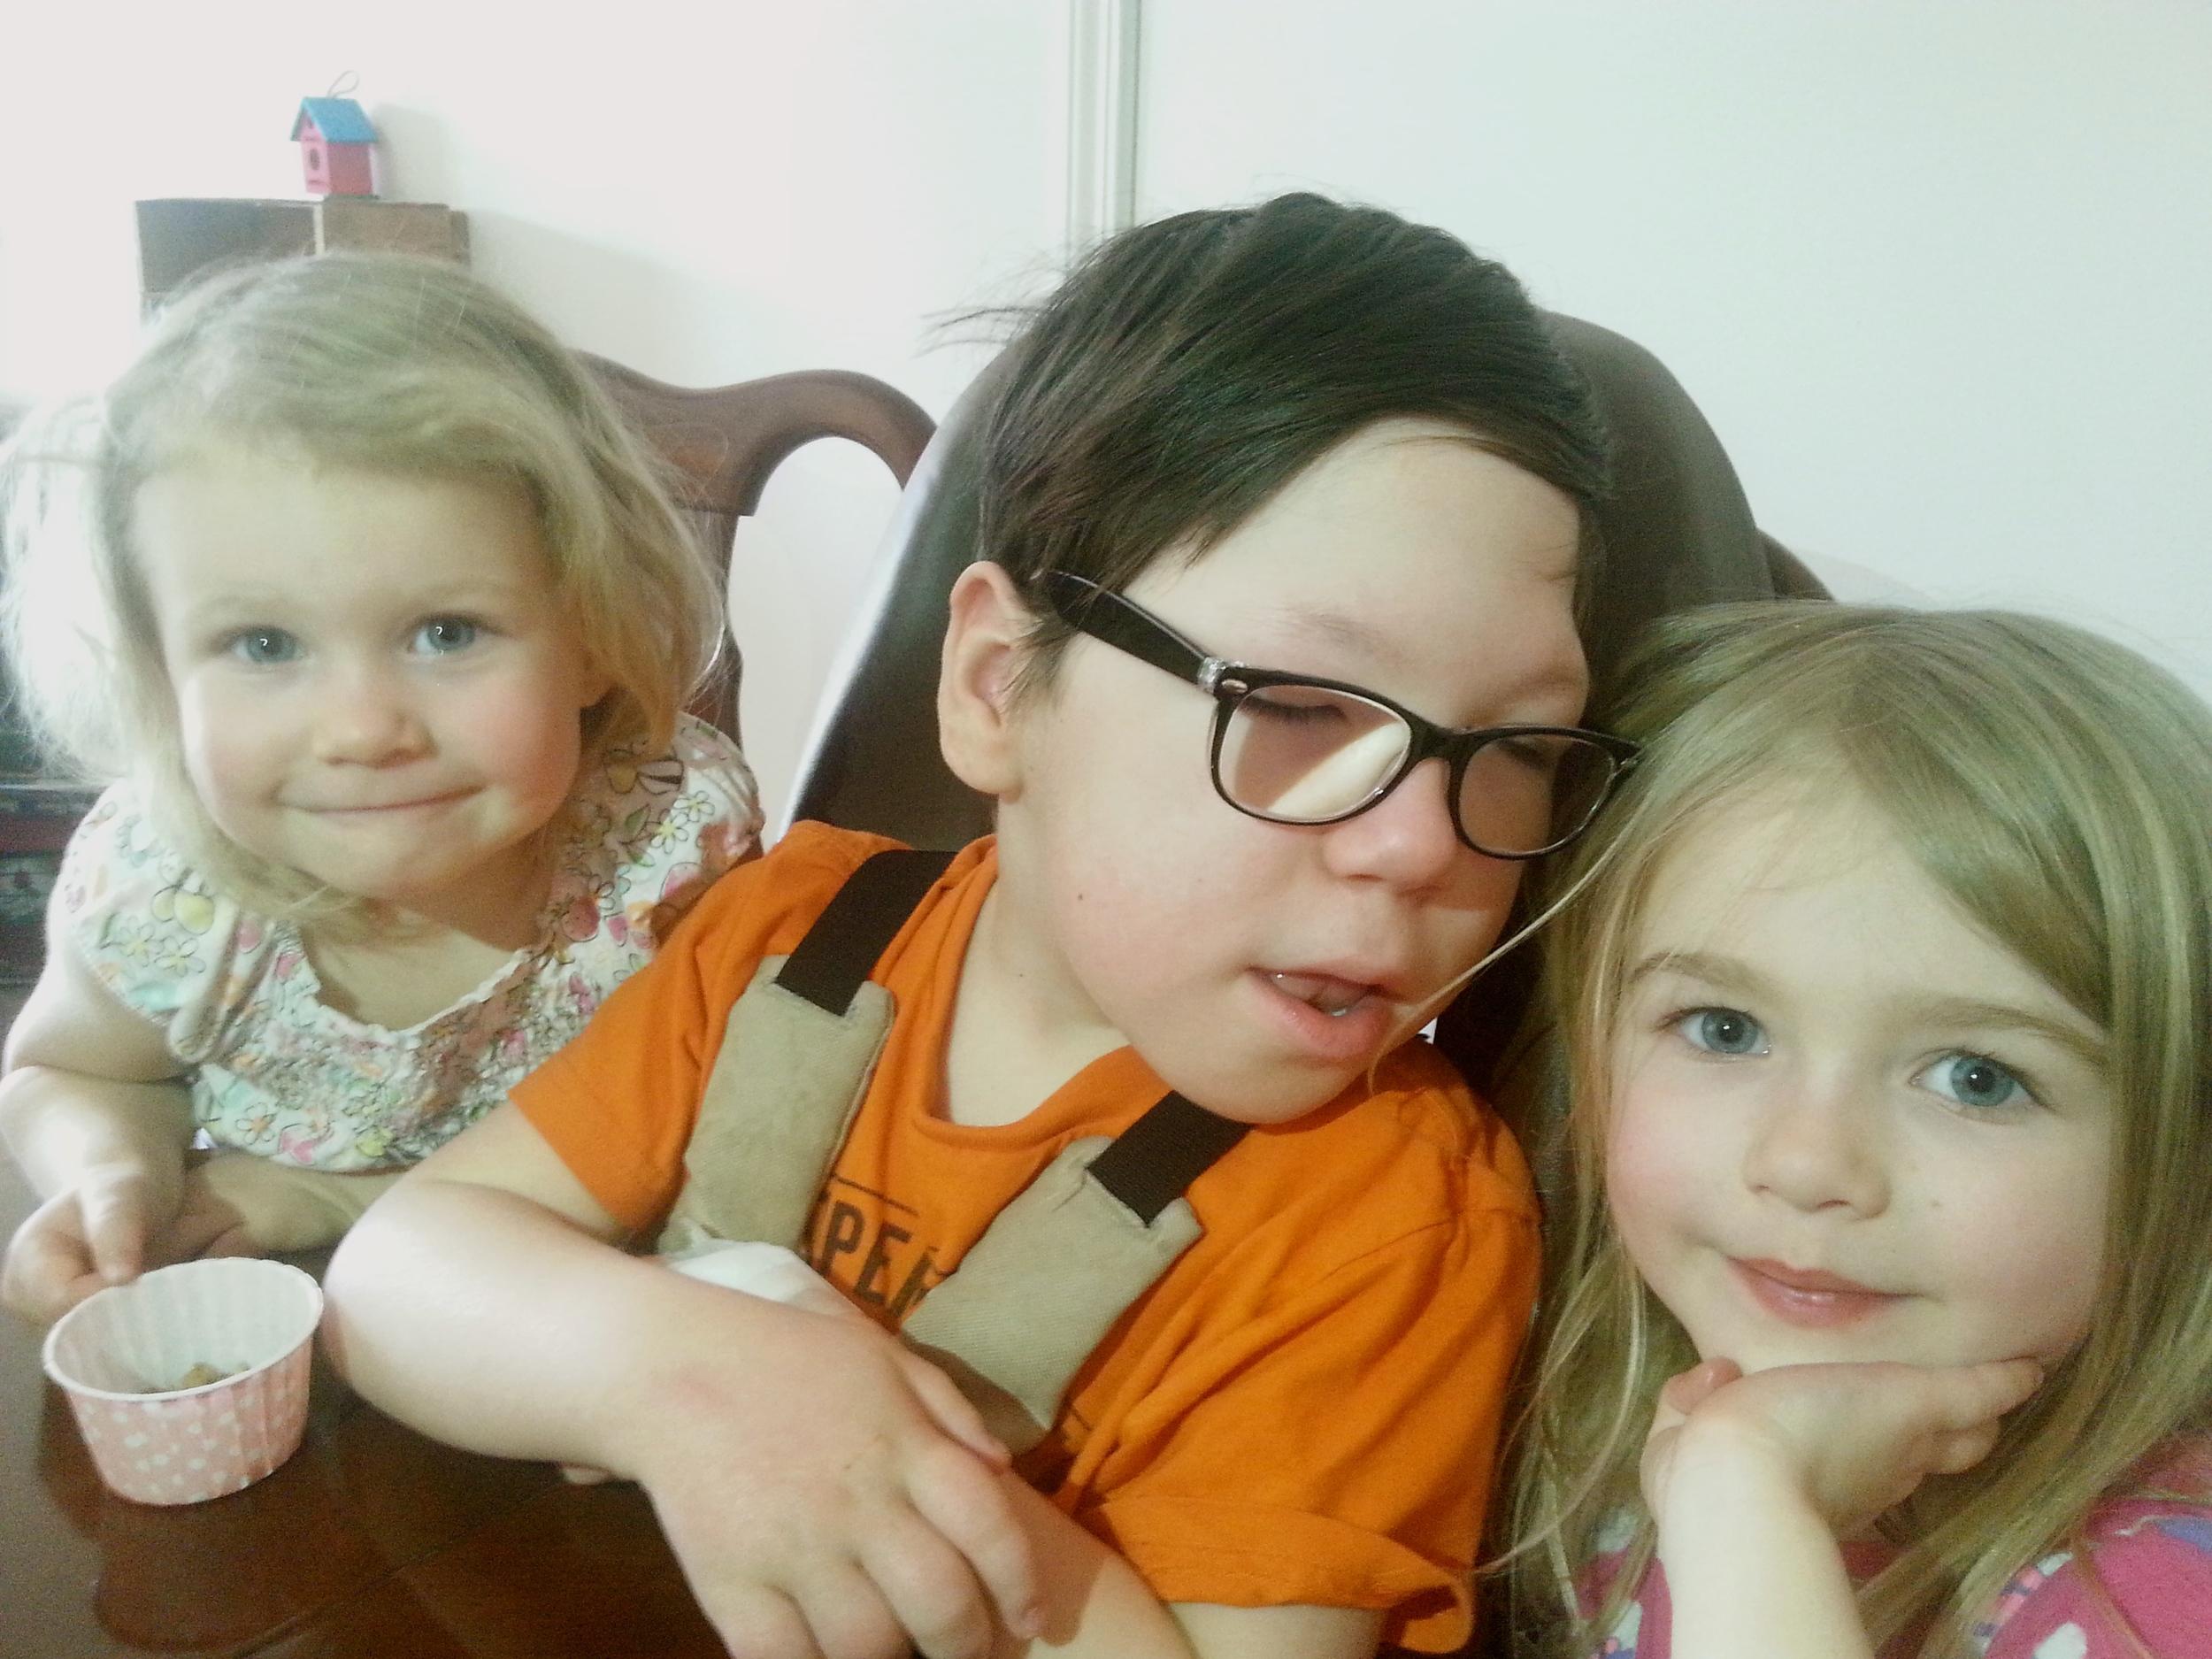 The Collin pros: the cousins.